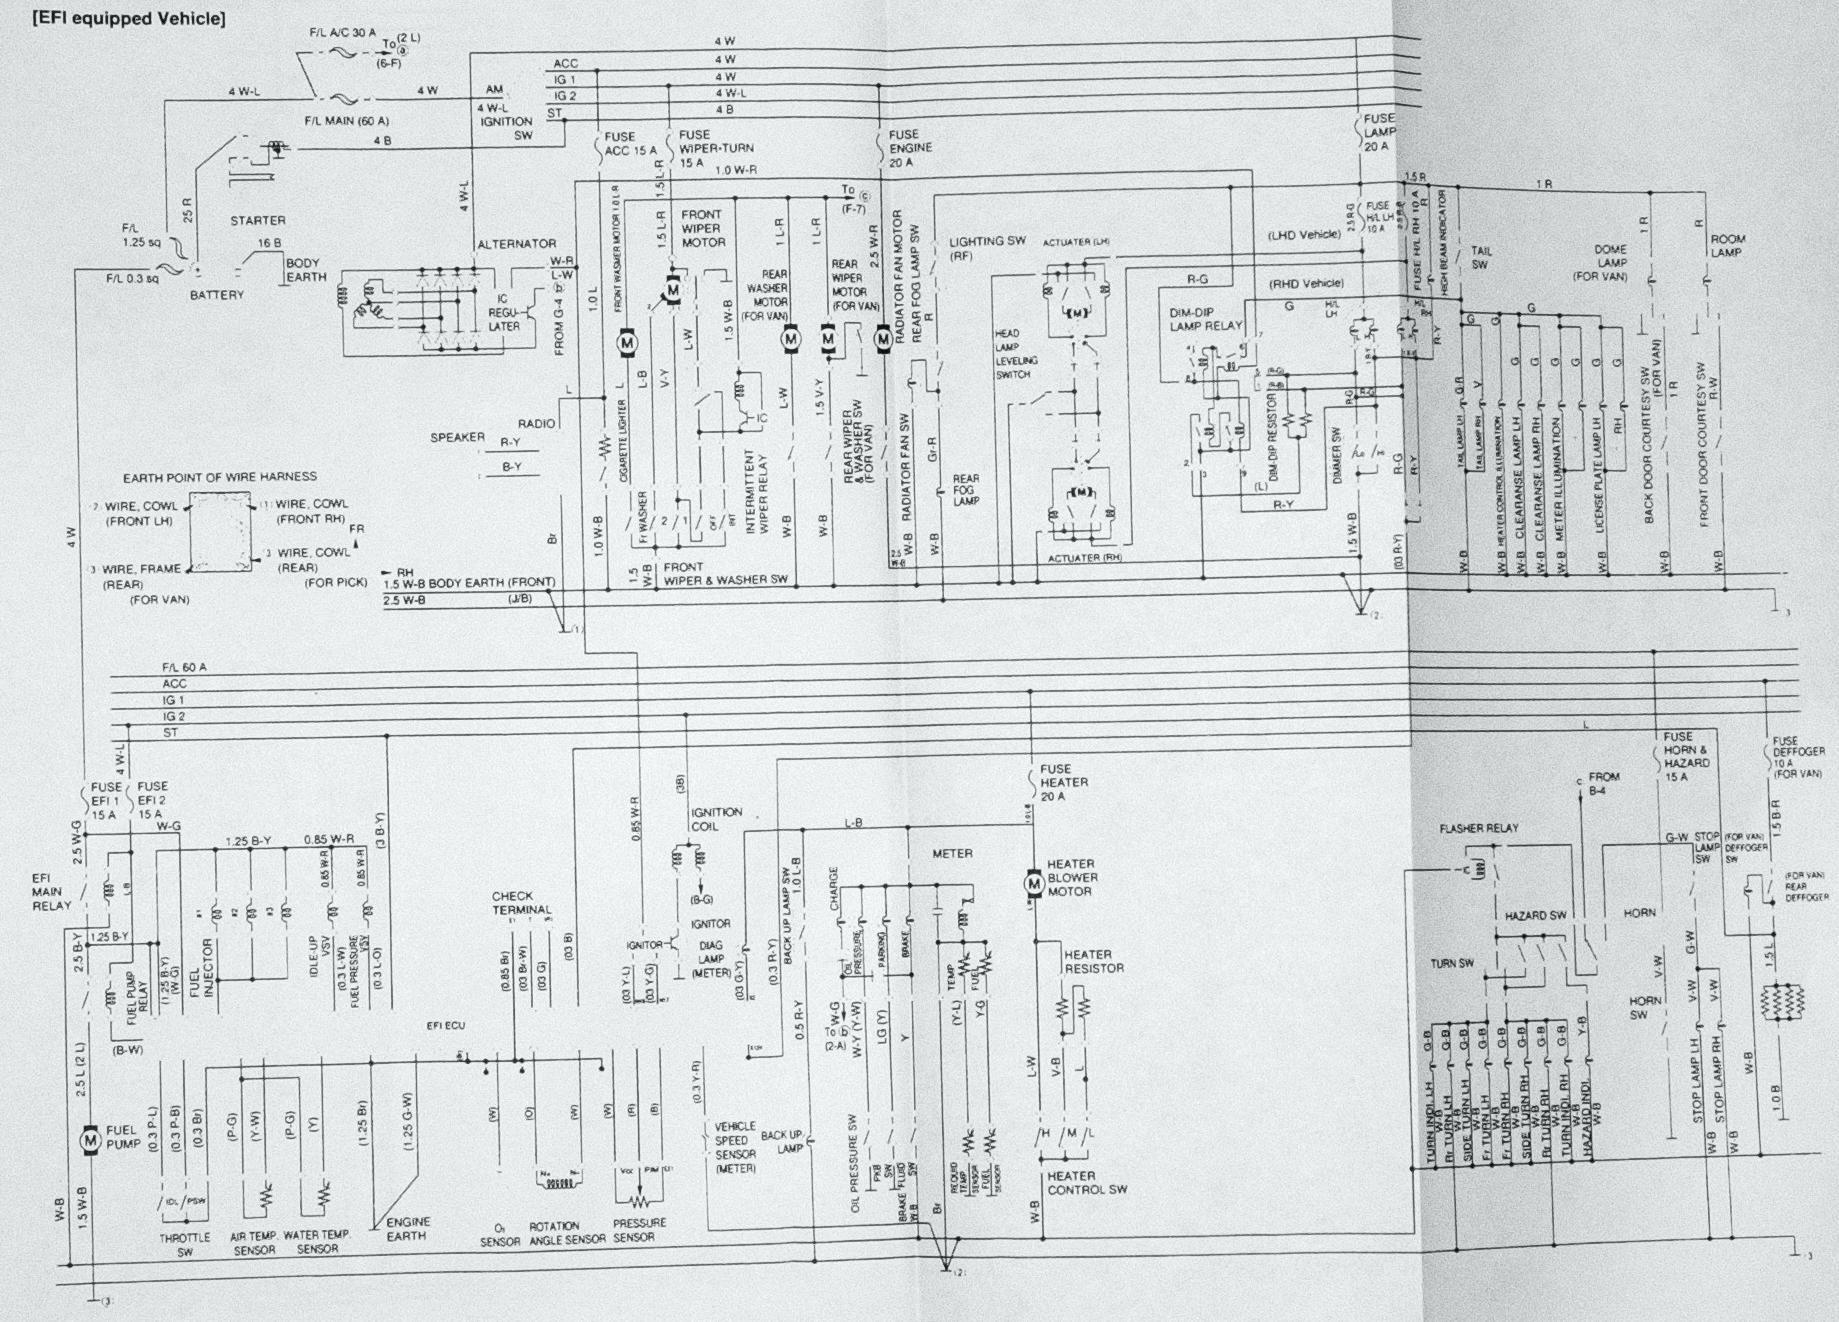 Acura Tl Engine Diagram Wiring Harness Wiring Diagram Wiring